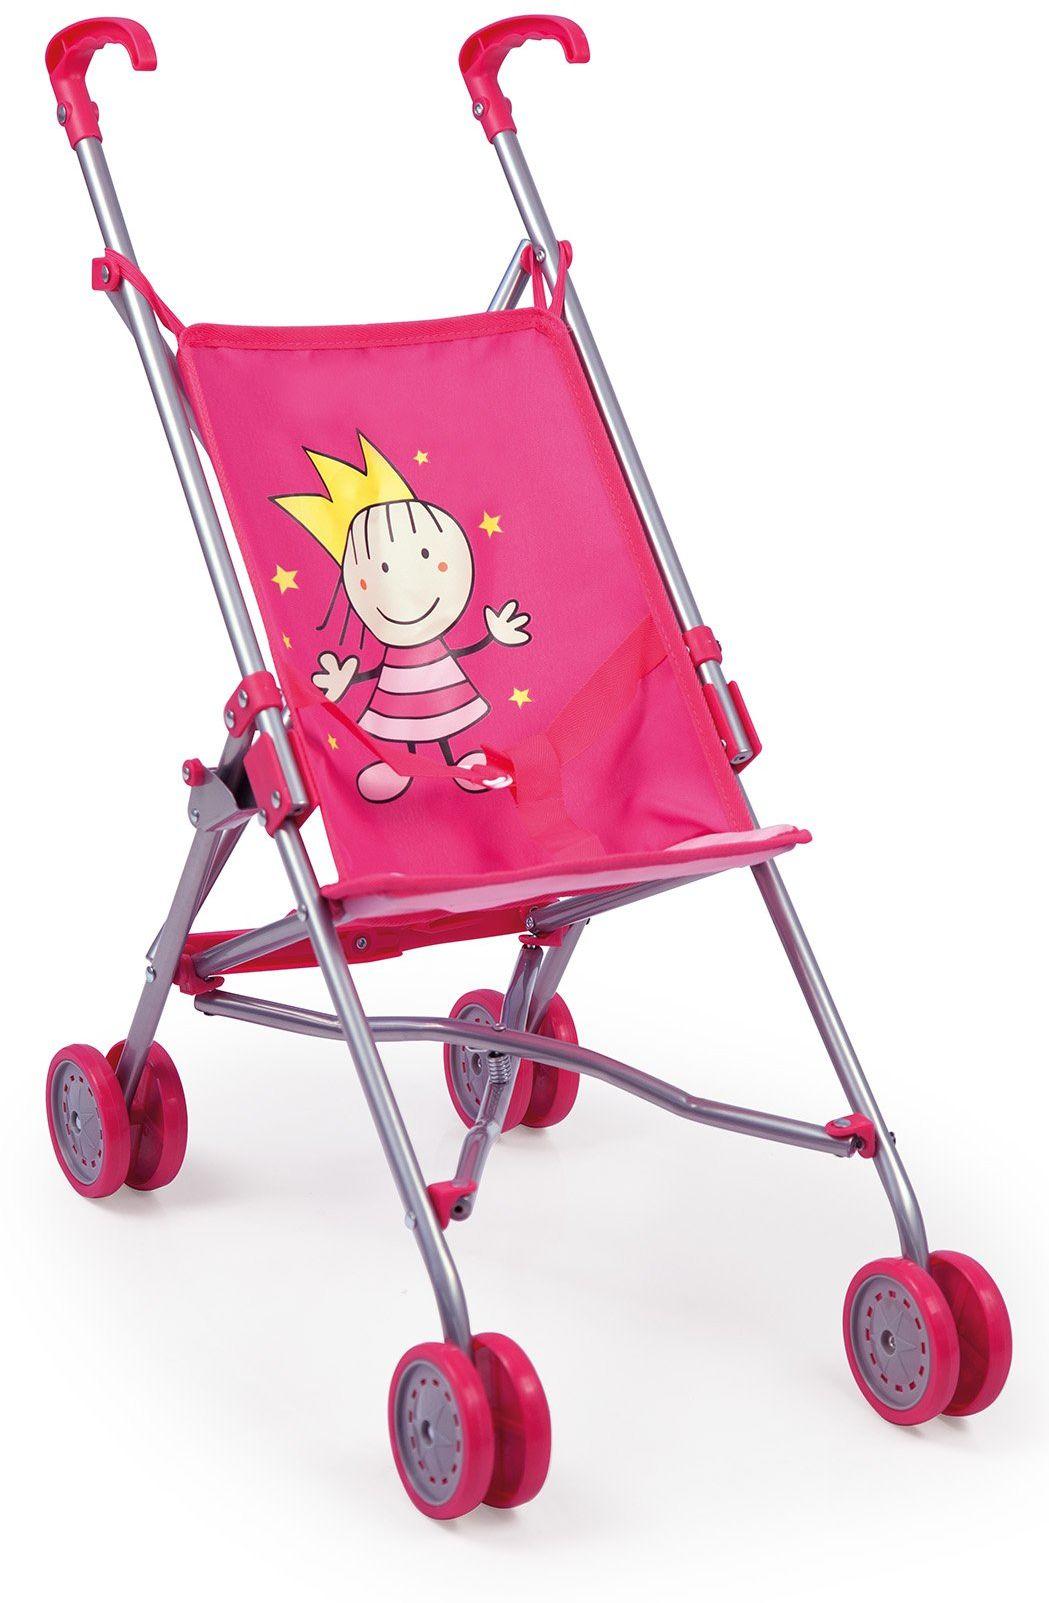 Bayer Design 3018201 lalka buggy księżniczka